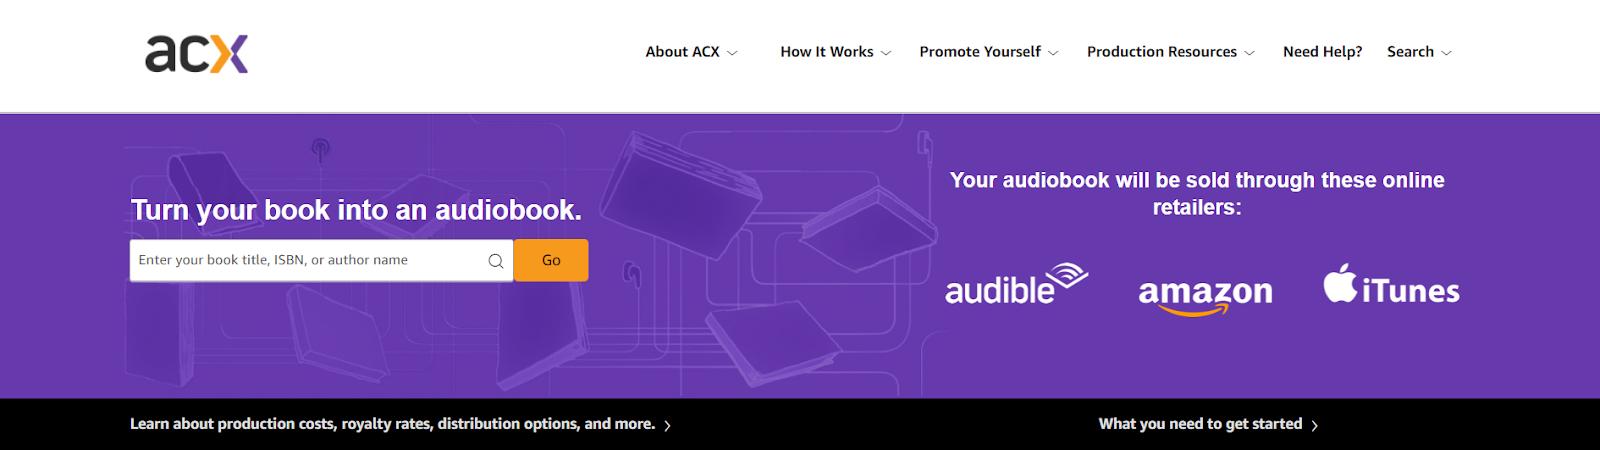 Sitio web de ACX